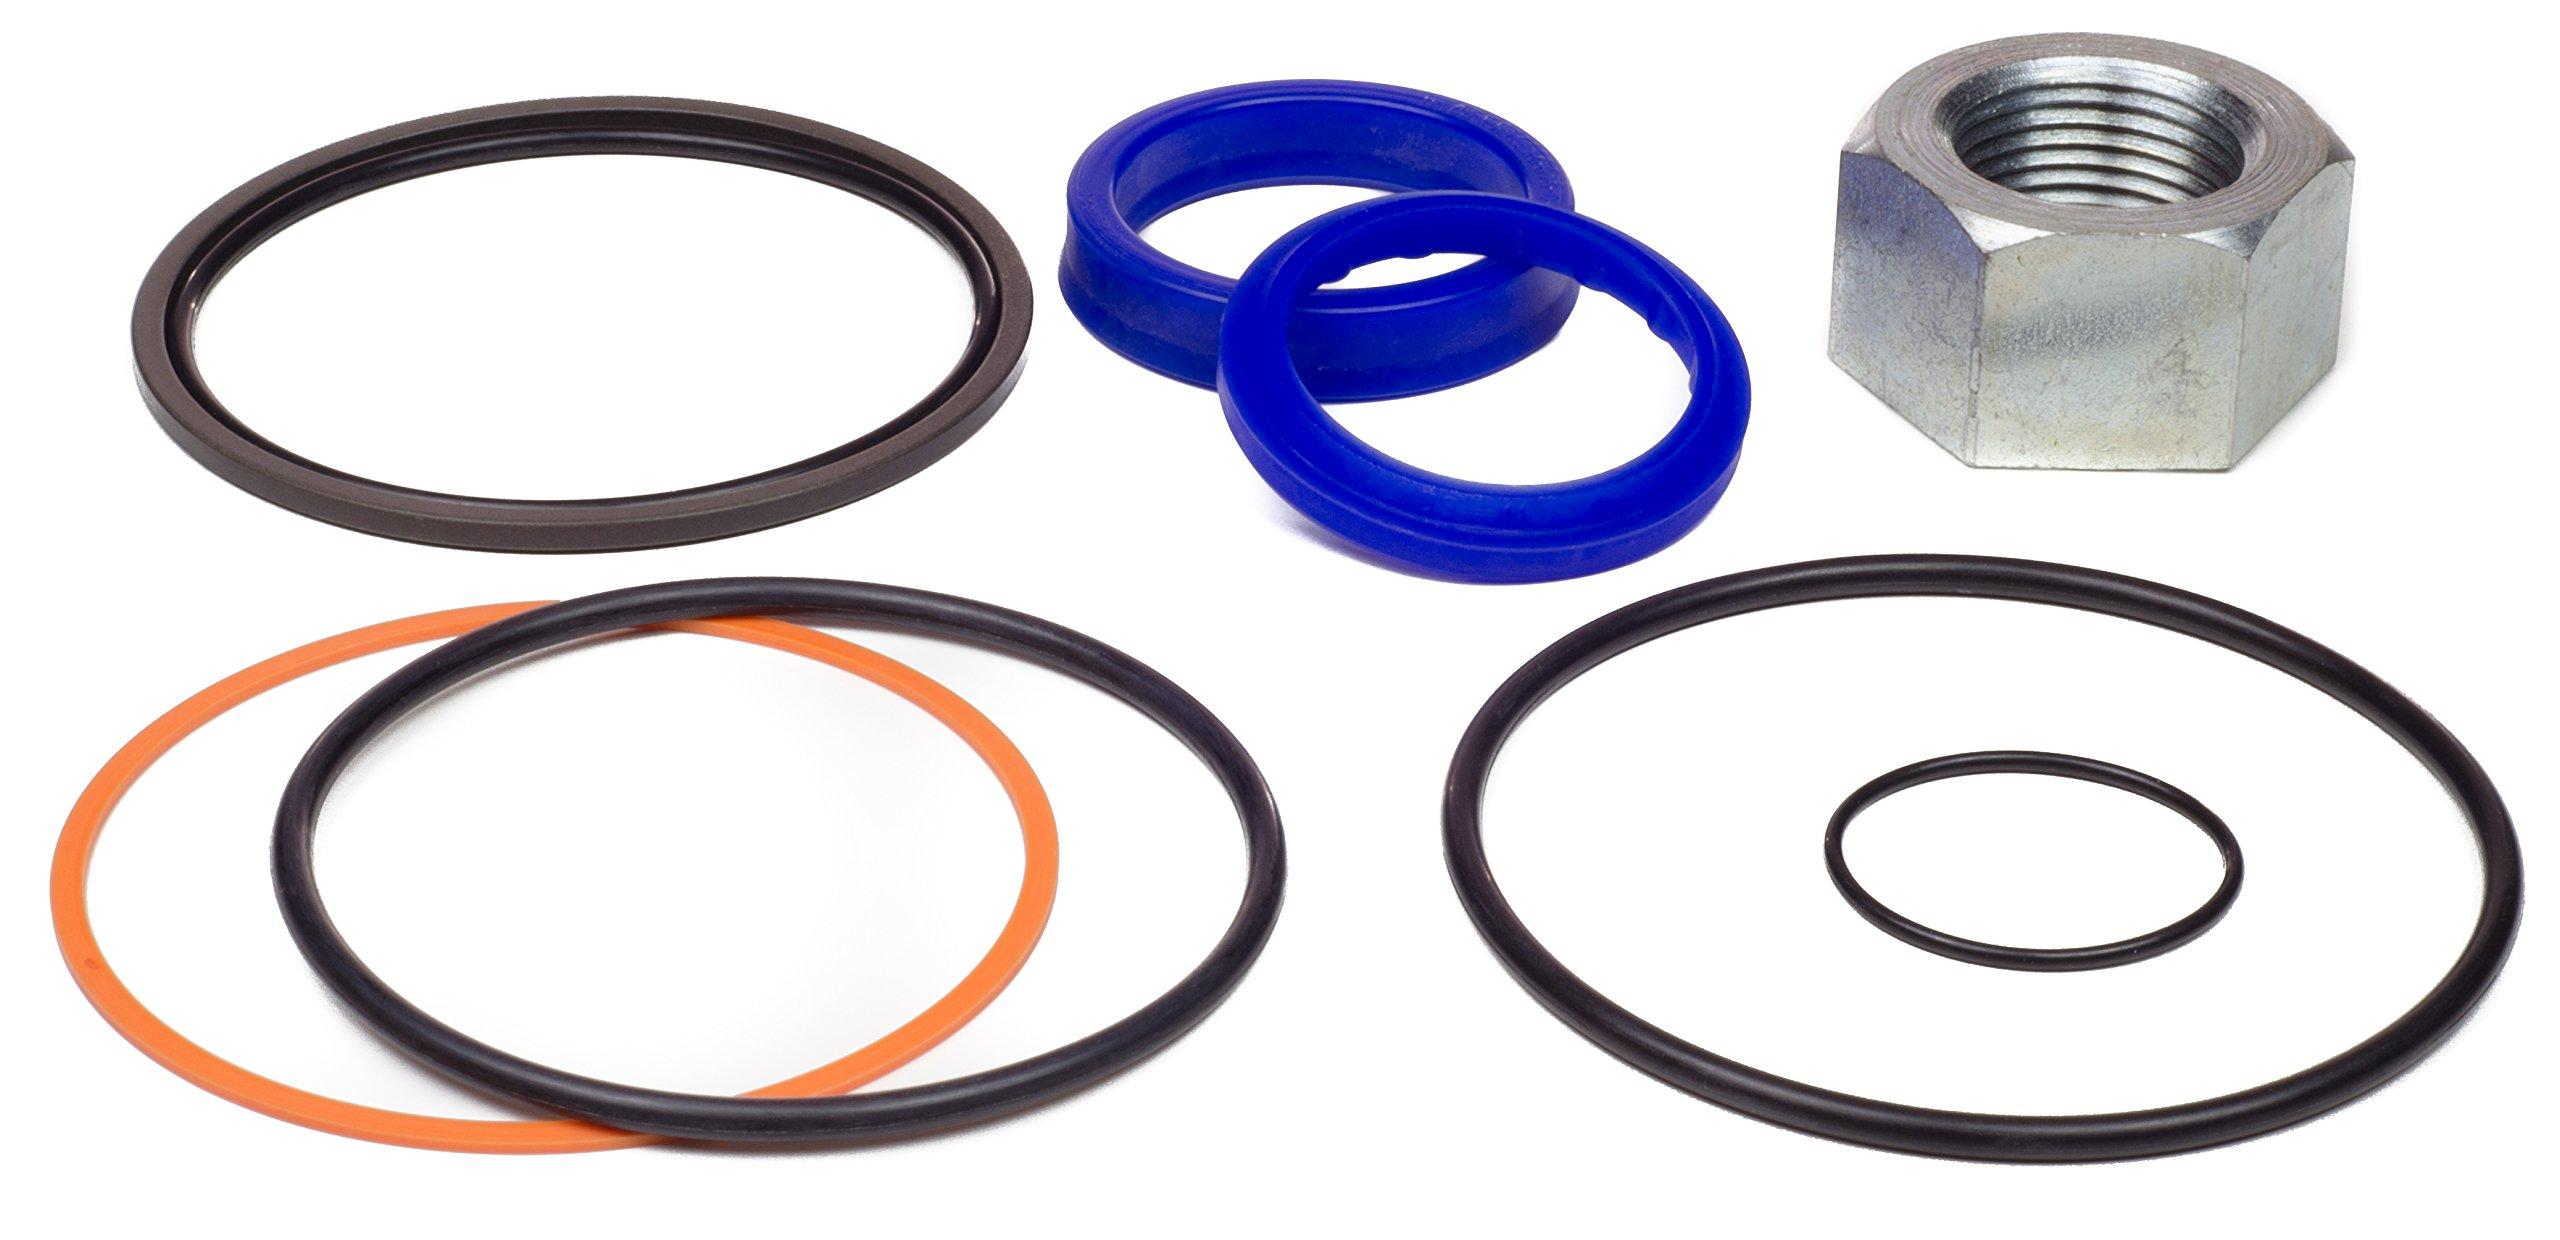 Kit King - Bobcat 6558847 Aftermarket Hydraulic Cylinder Seal Kit